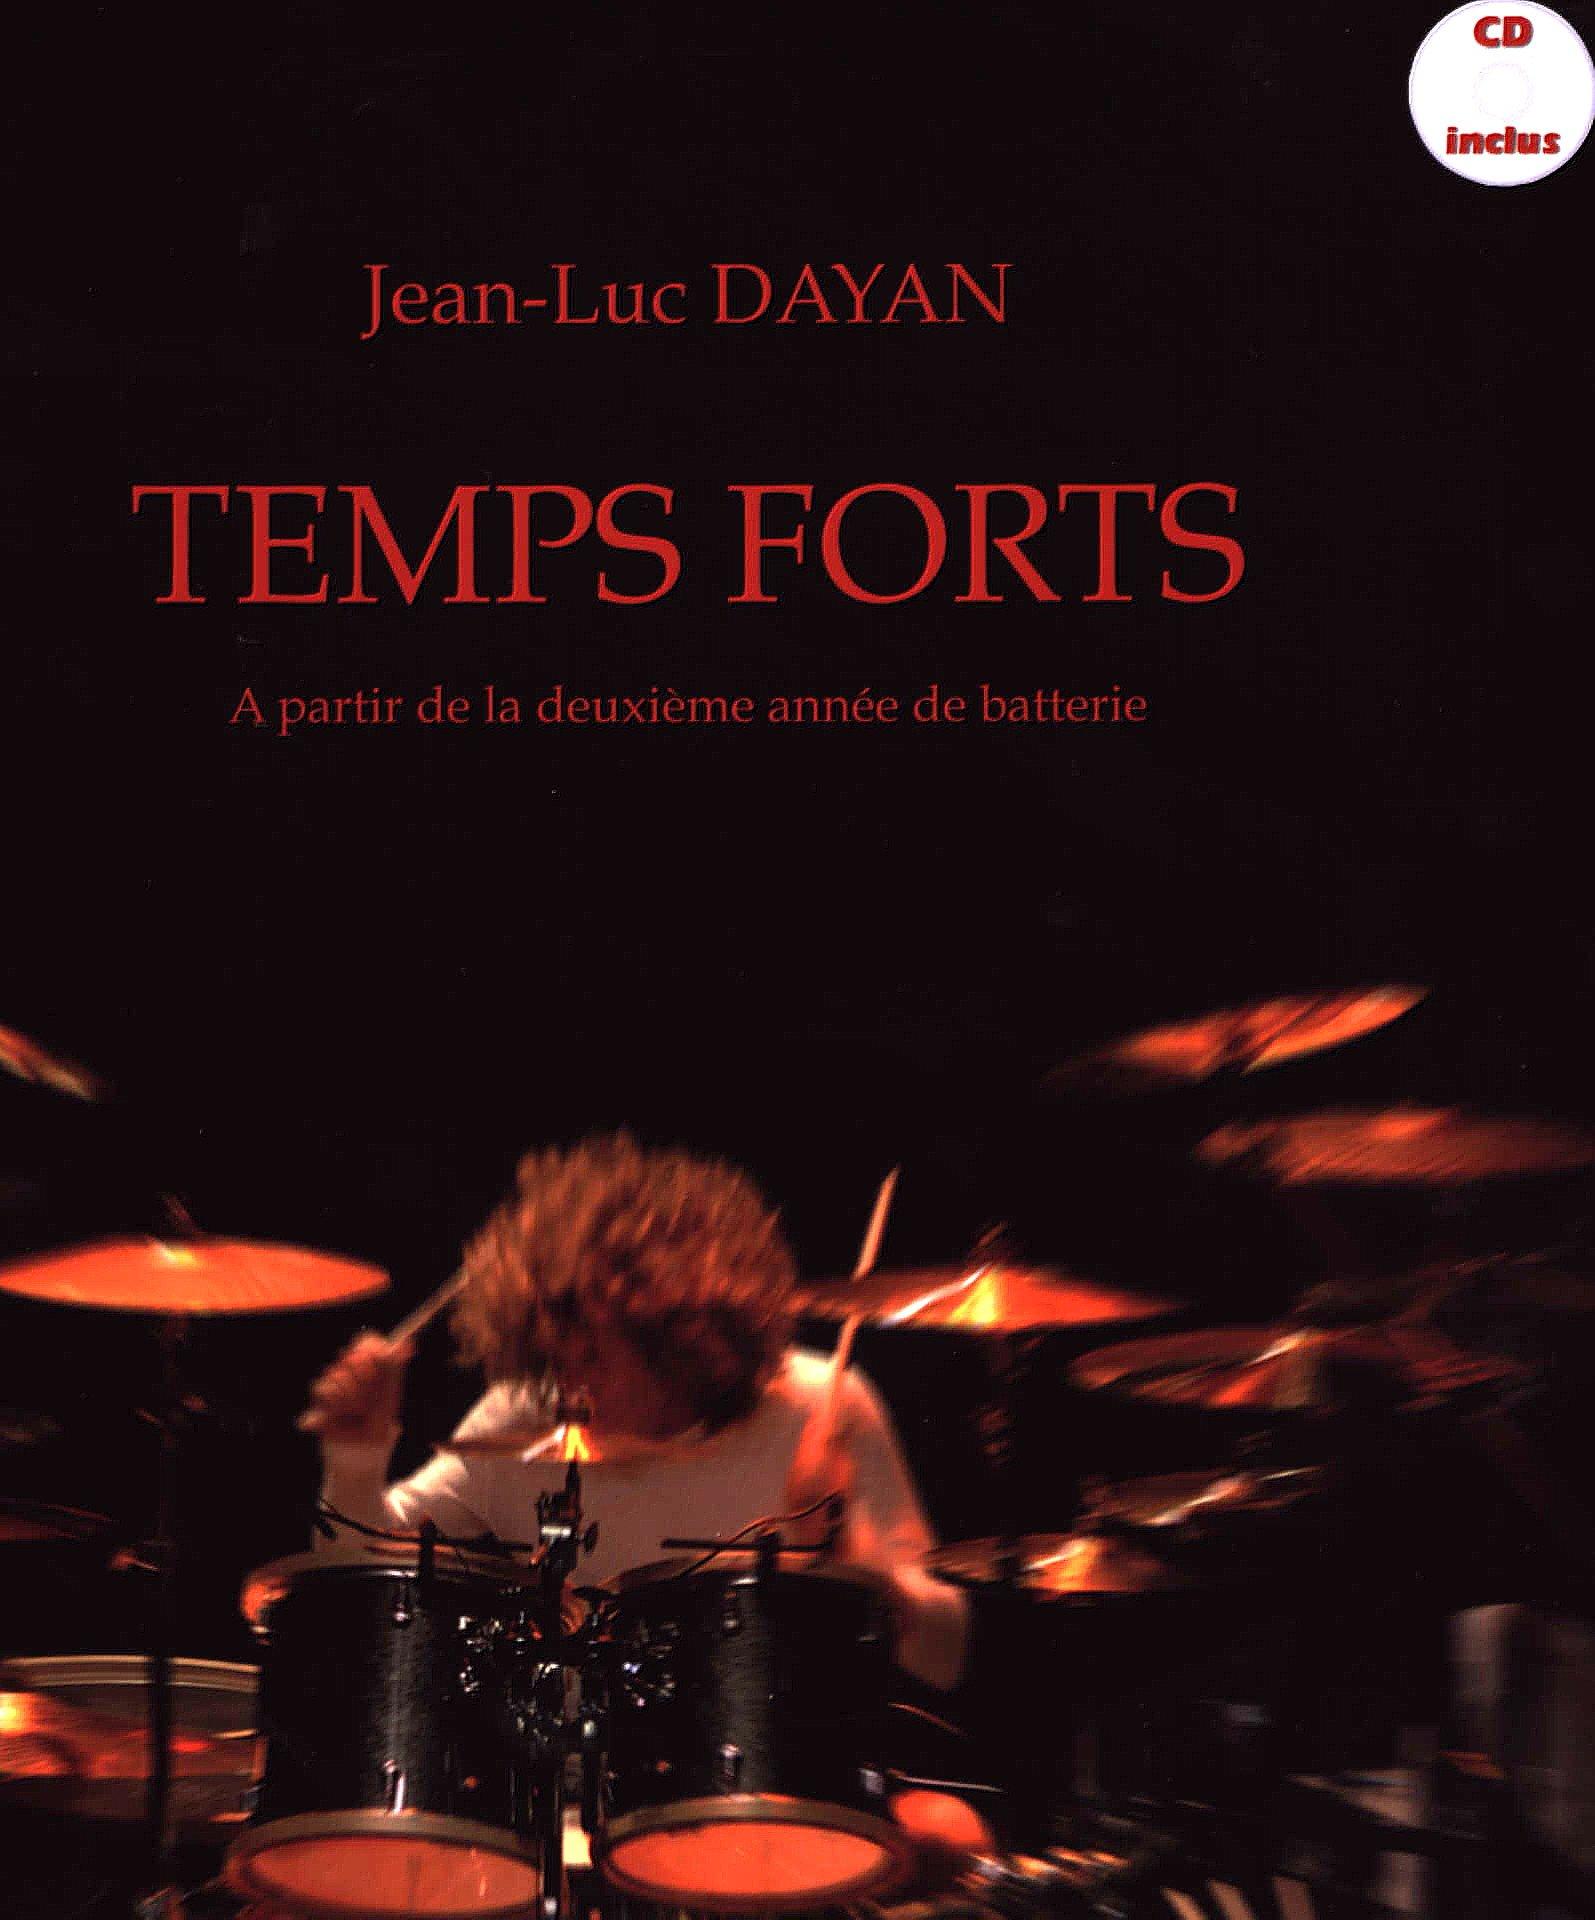 Temps forts Couverture à spirales – 1 janvier 2000 Jean Luc DAYAN robert martin B005XJSCU8 Musique